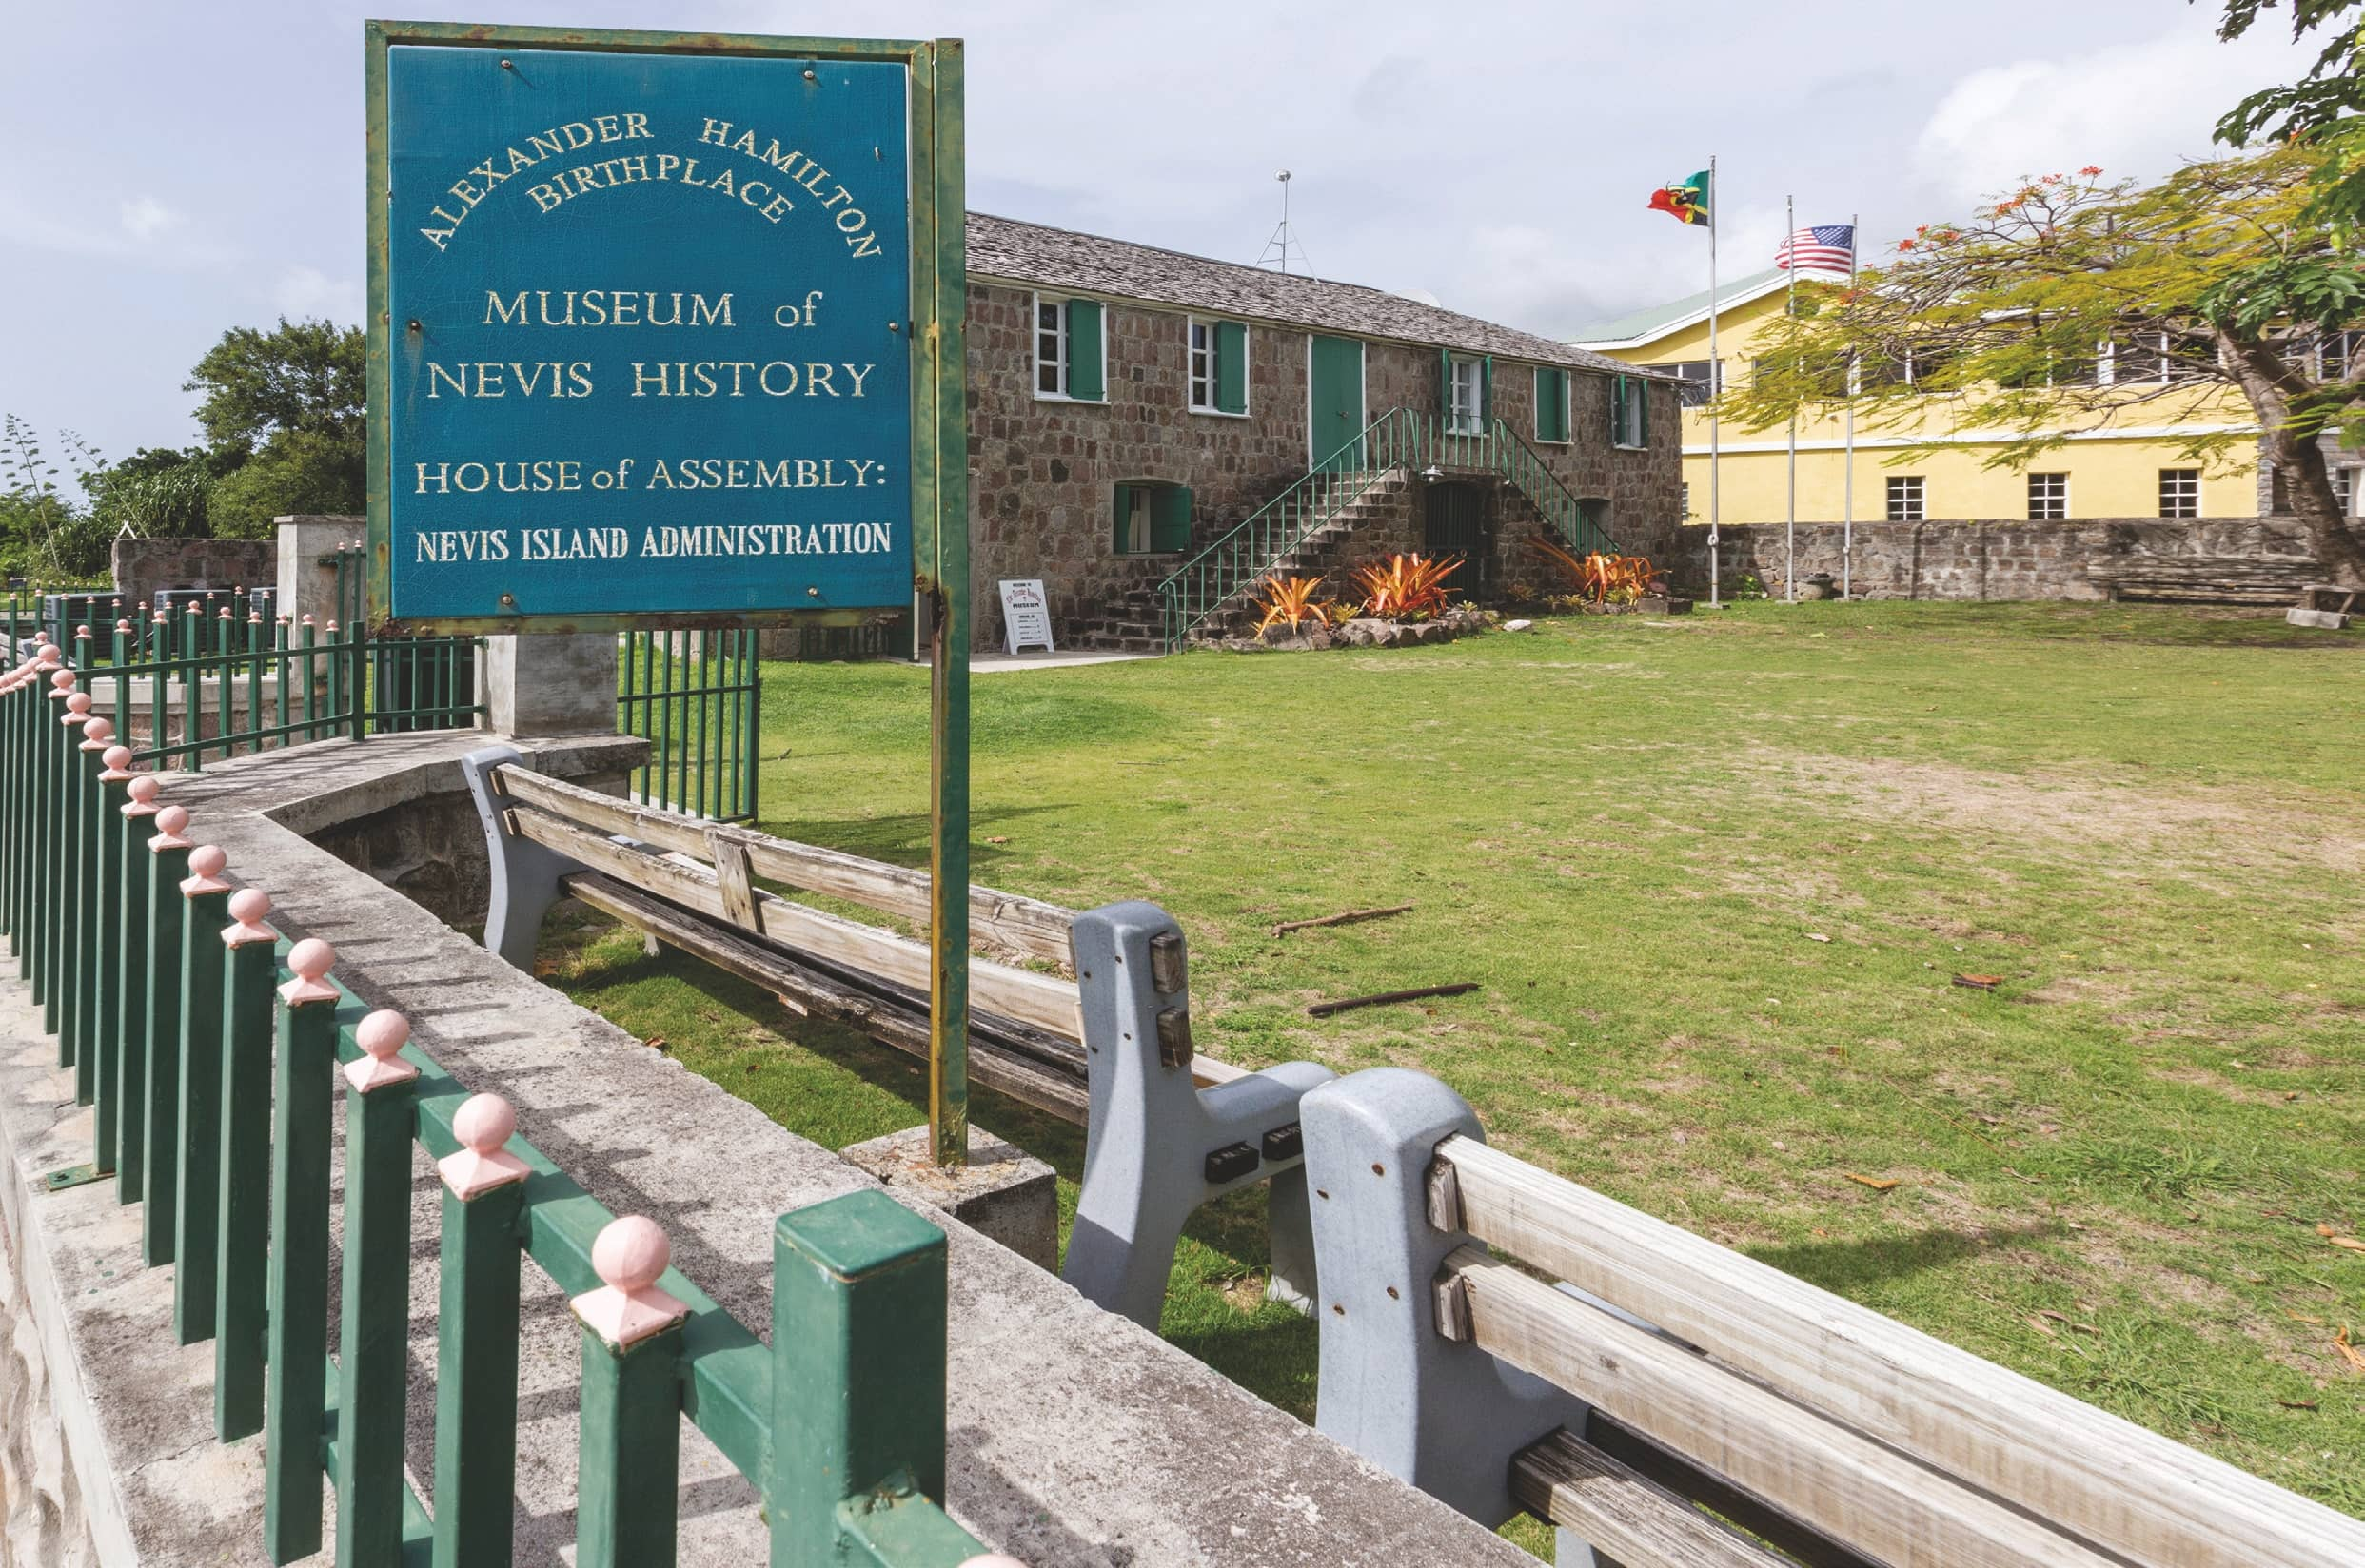 Nevis Island: Alexander Hamilton's Birthplace